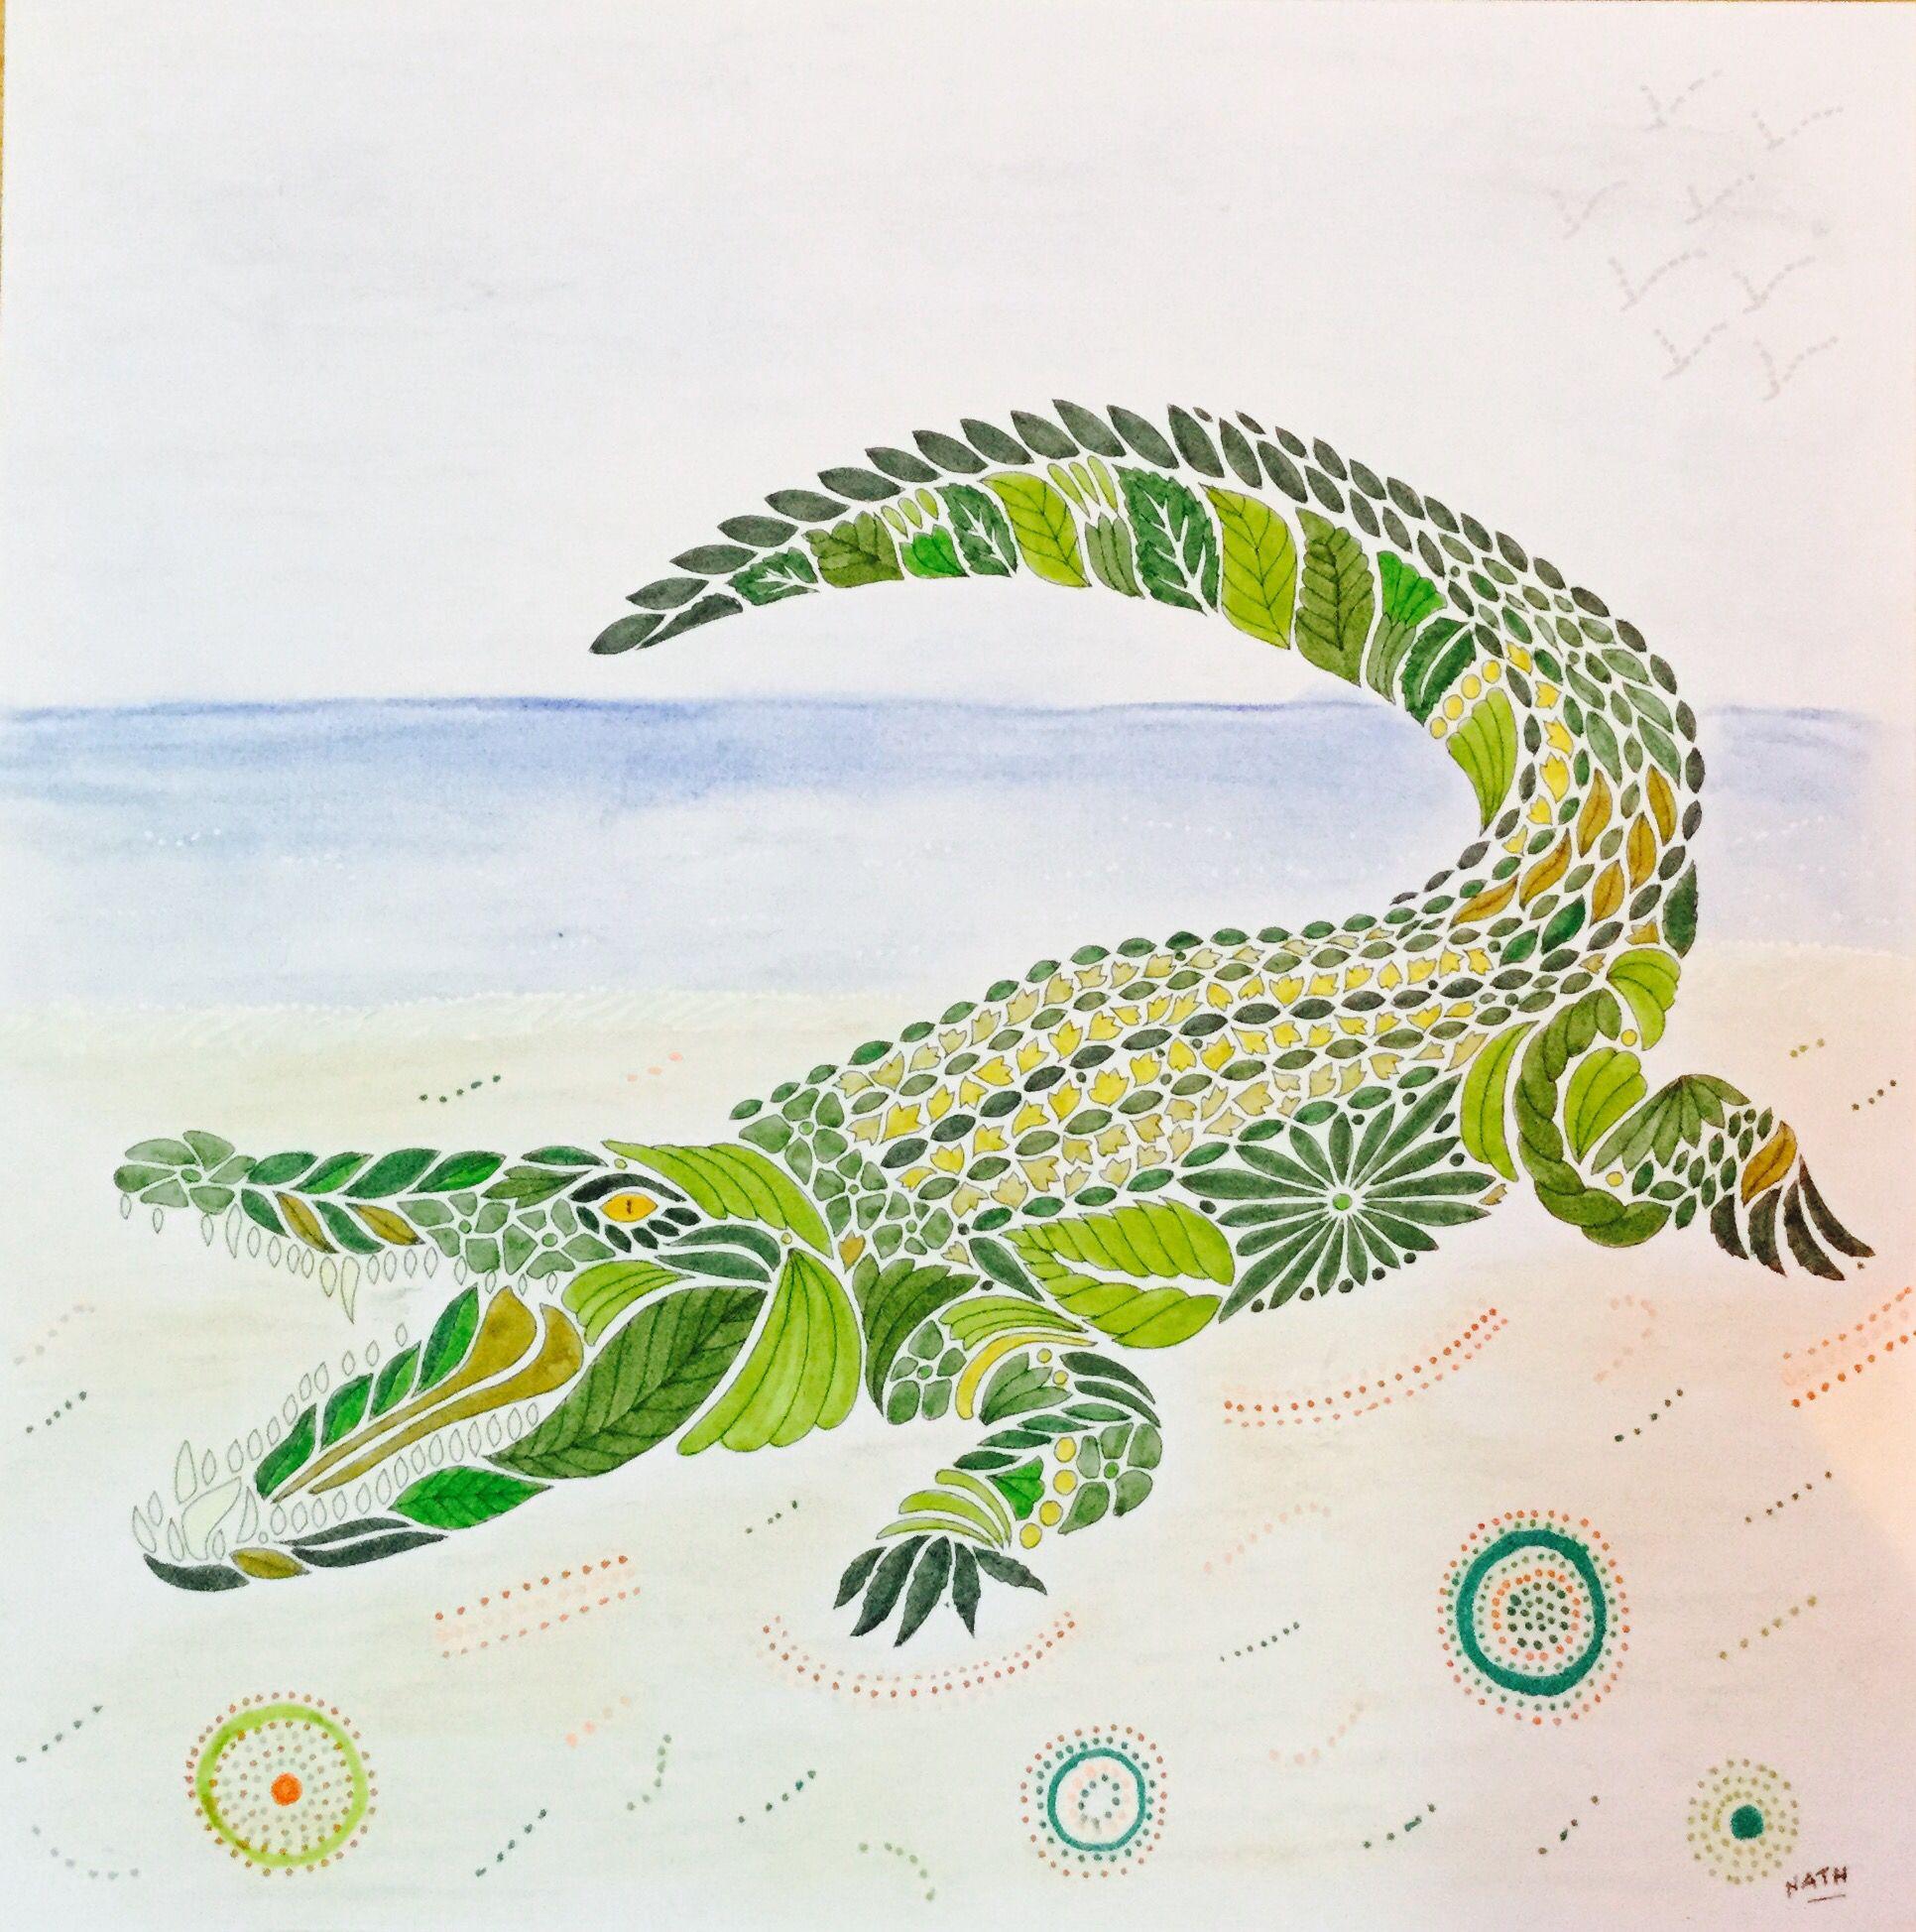 My colouring millie marotta wild savannah crocodile millie marotta 1 in 2018 pinterest - Crocodile dessin ...